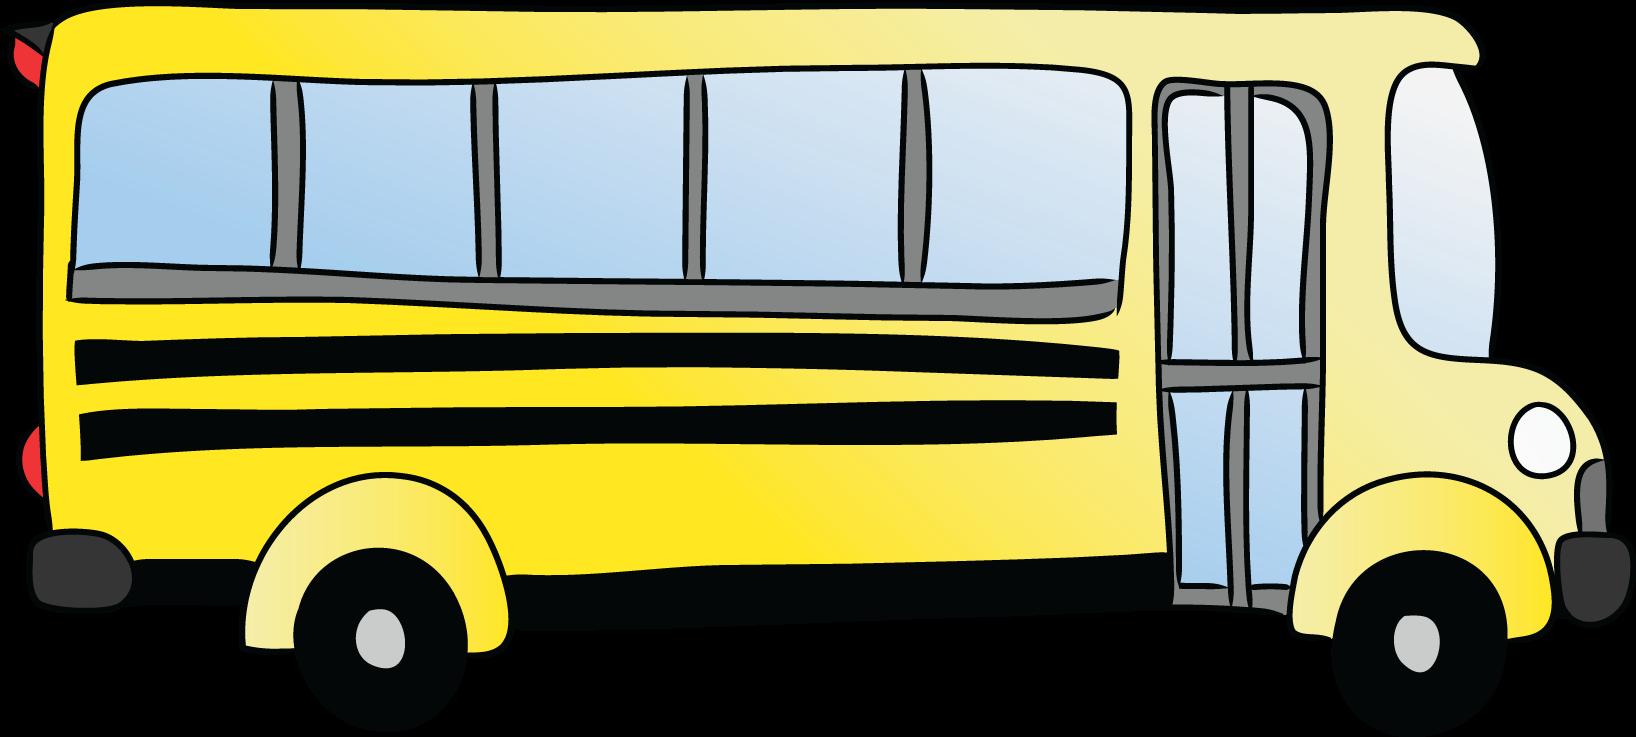 1636x737 Cartoon School Bus Clipart